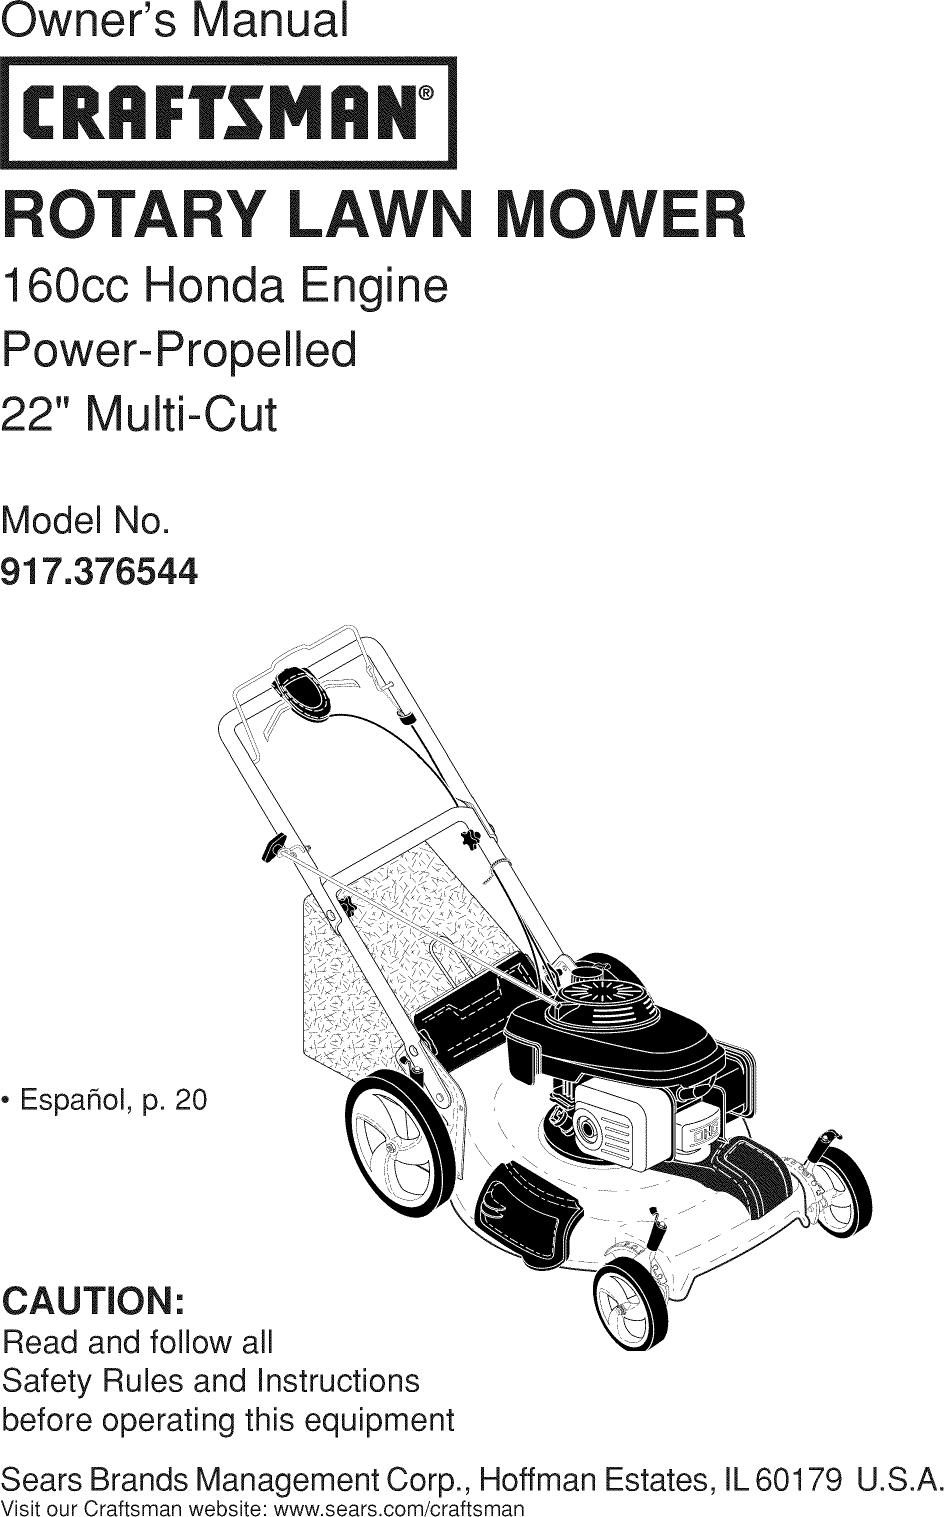 Craftsman Lawn Mower Gcv160 Owners Manual